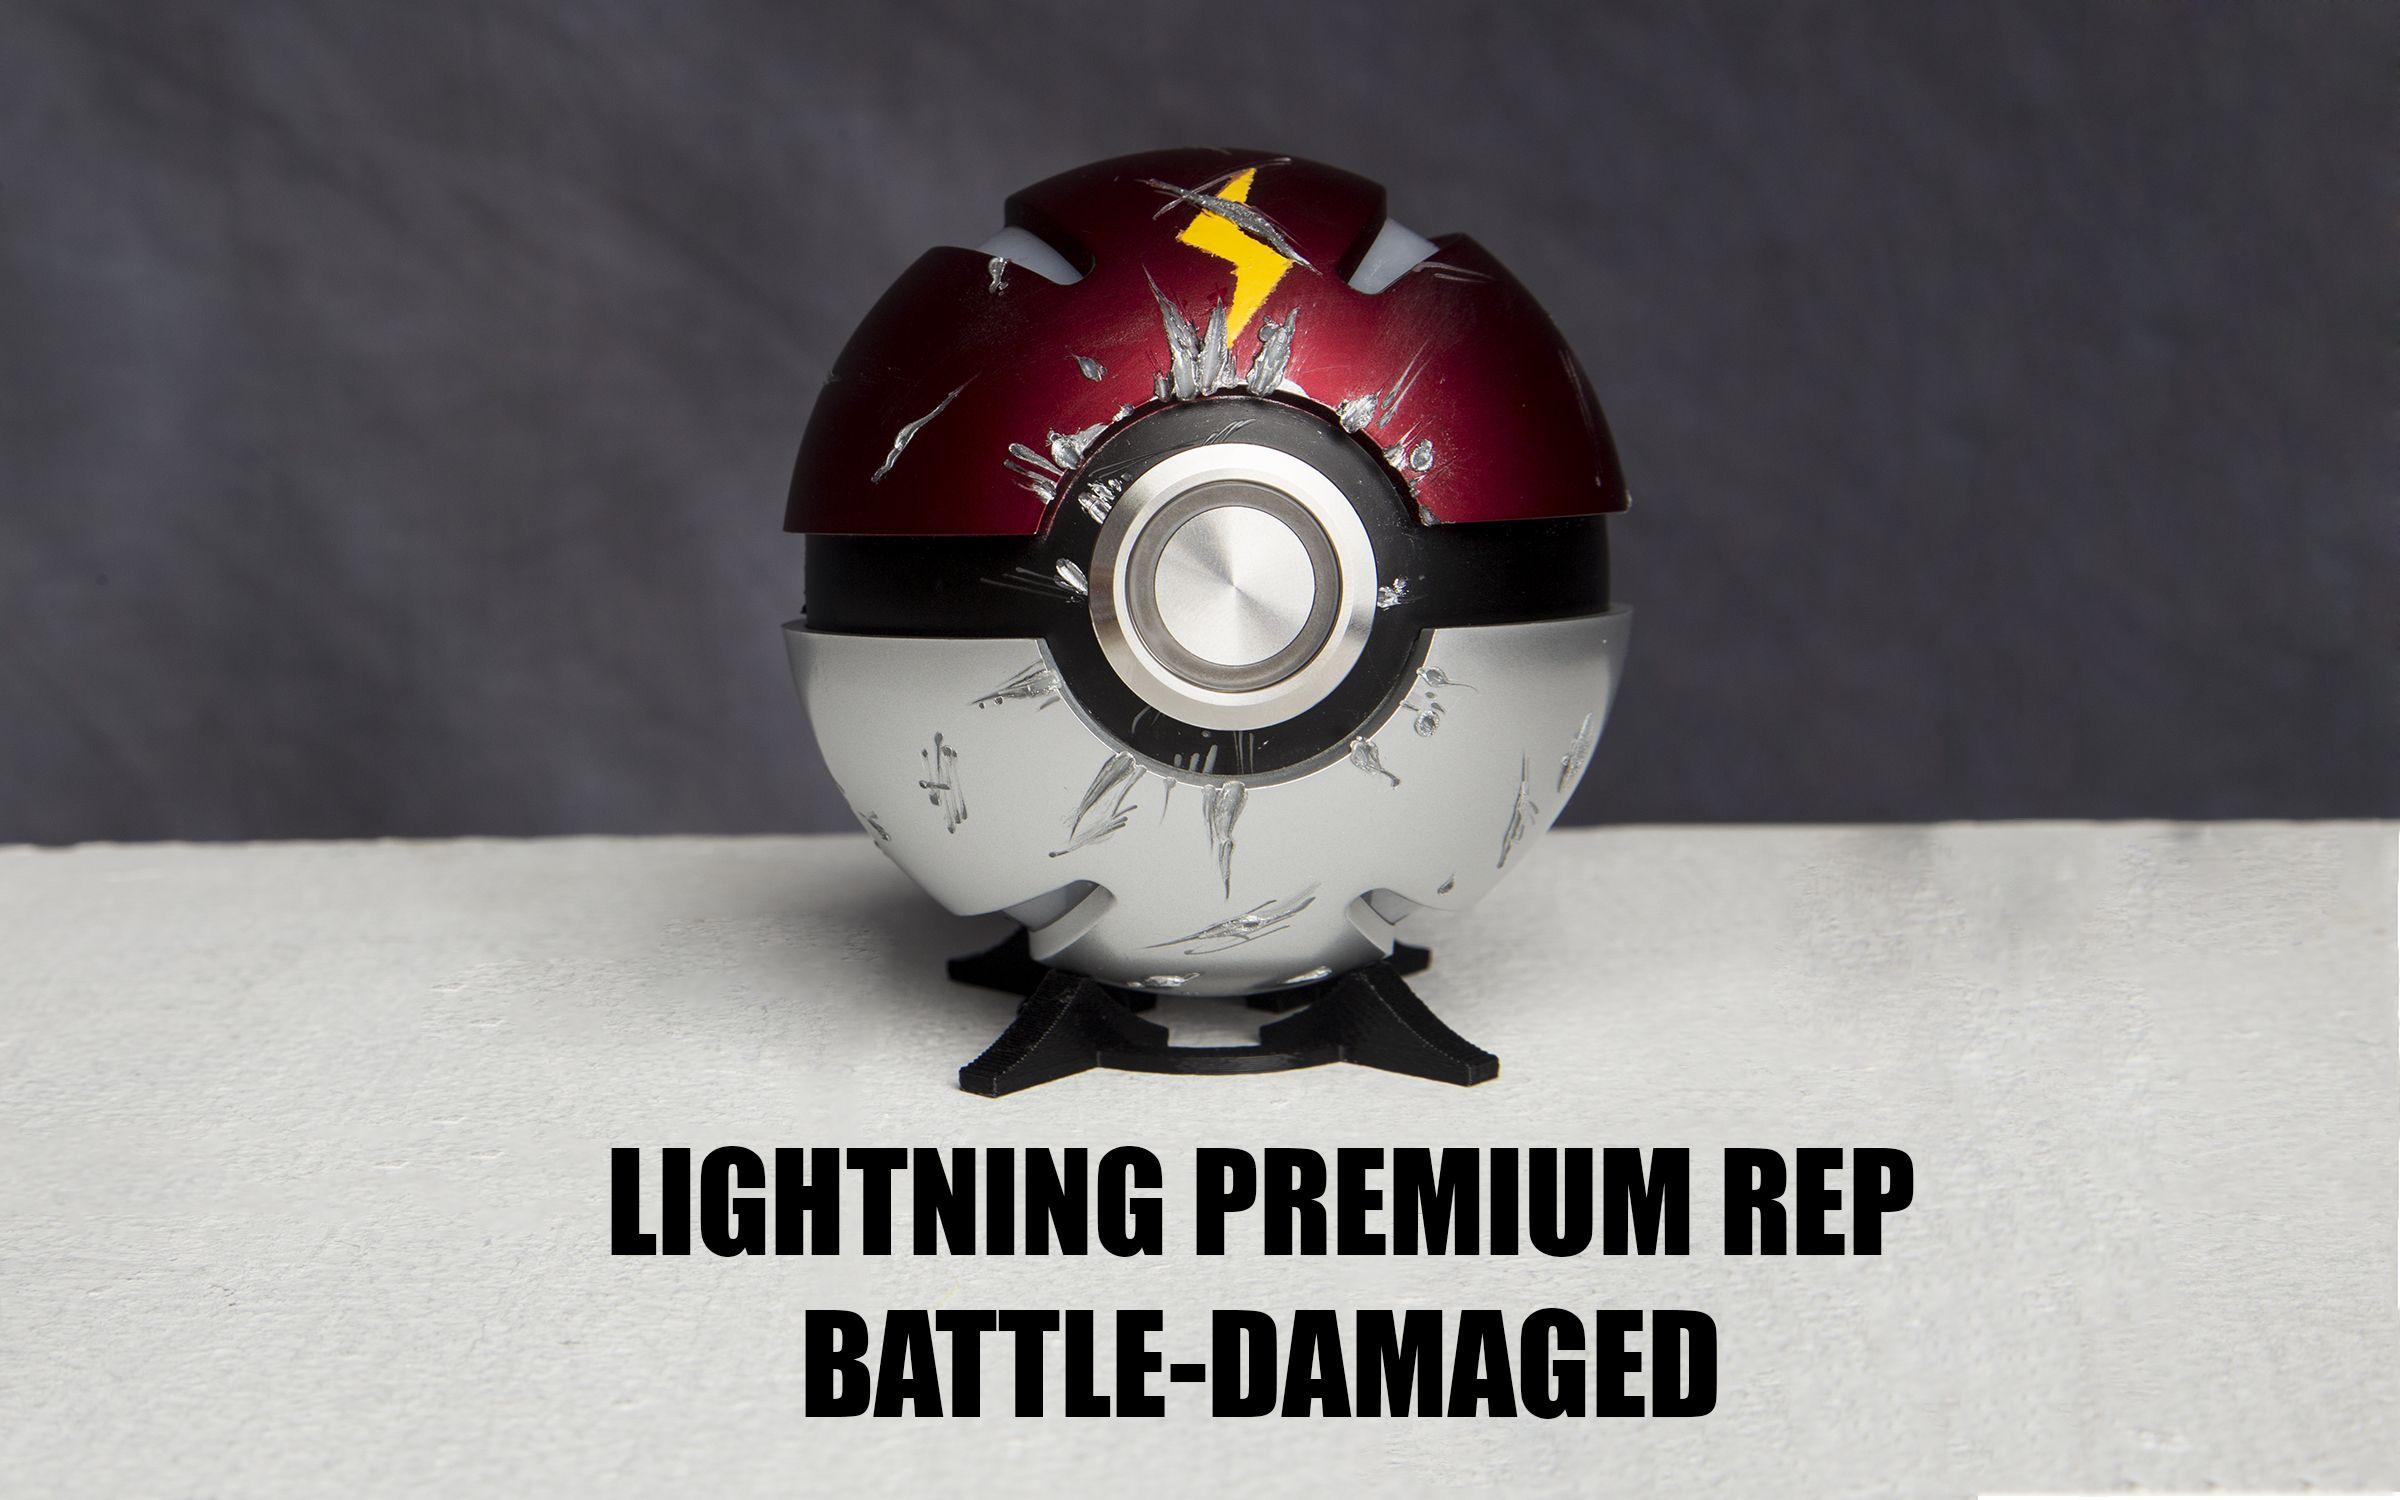 Premium Phoenix Orb Lightning Rep Battle Damaged The Phoenix Orb